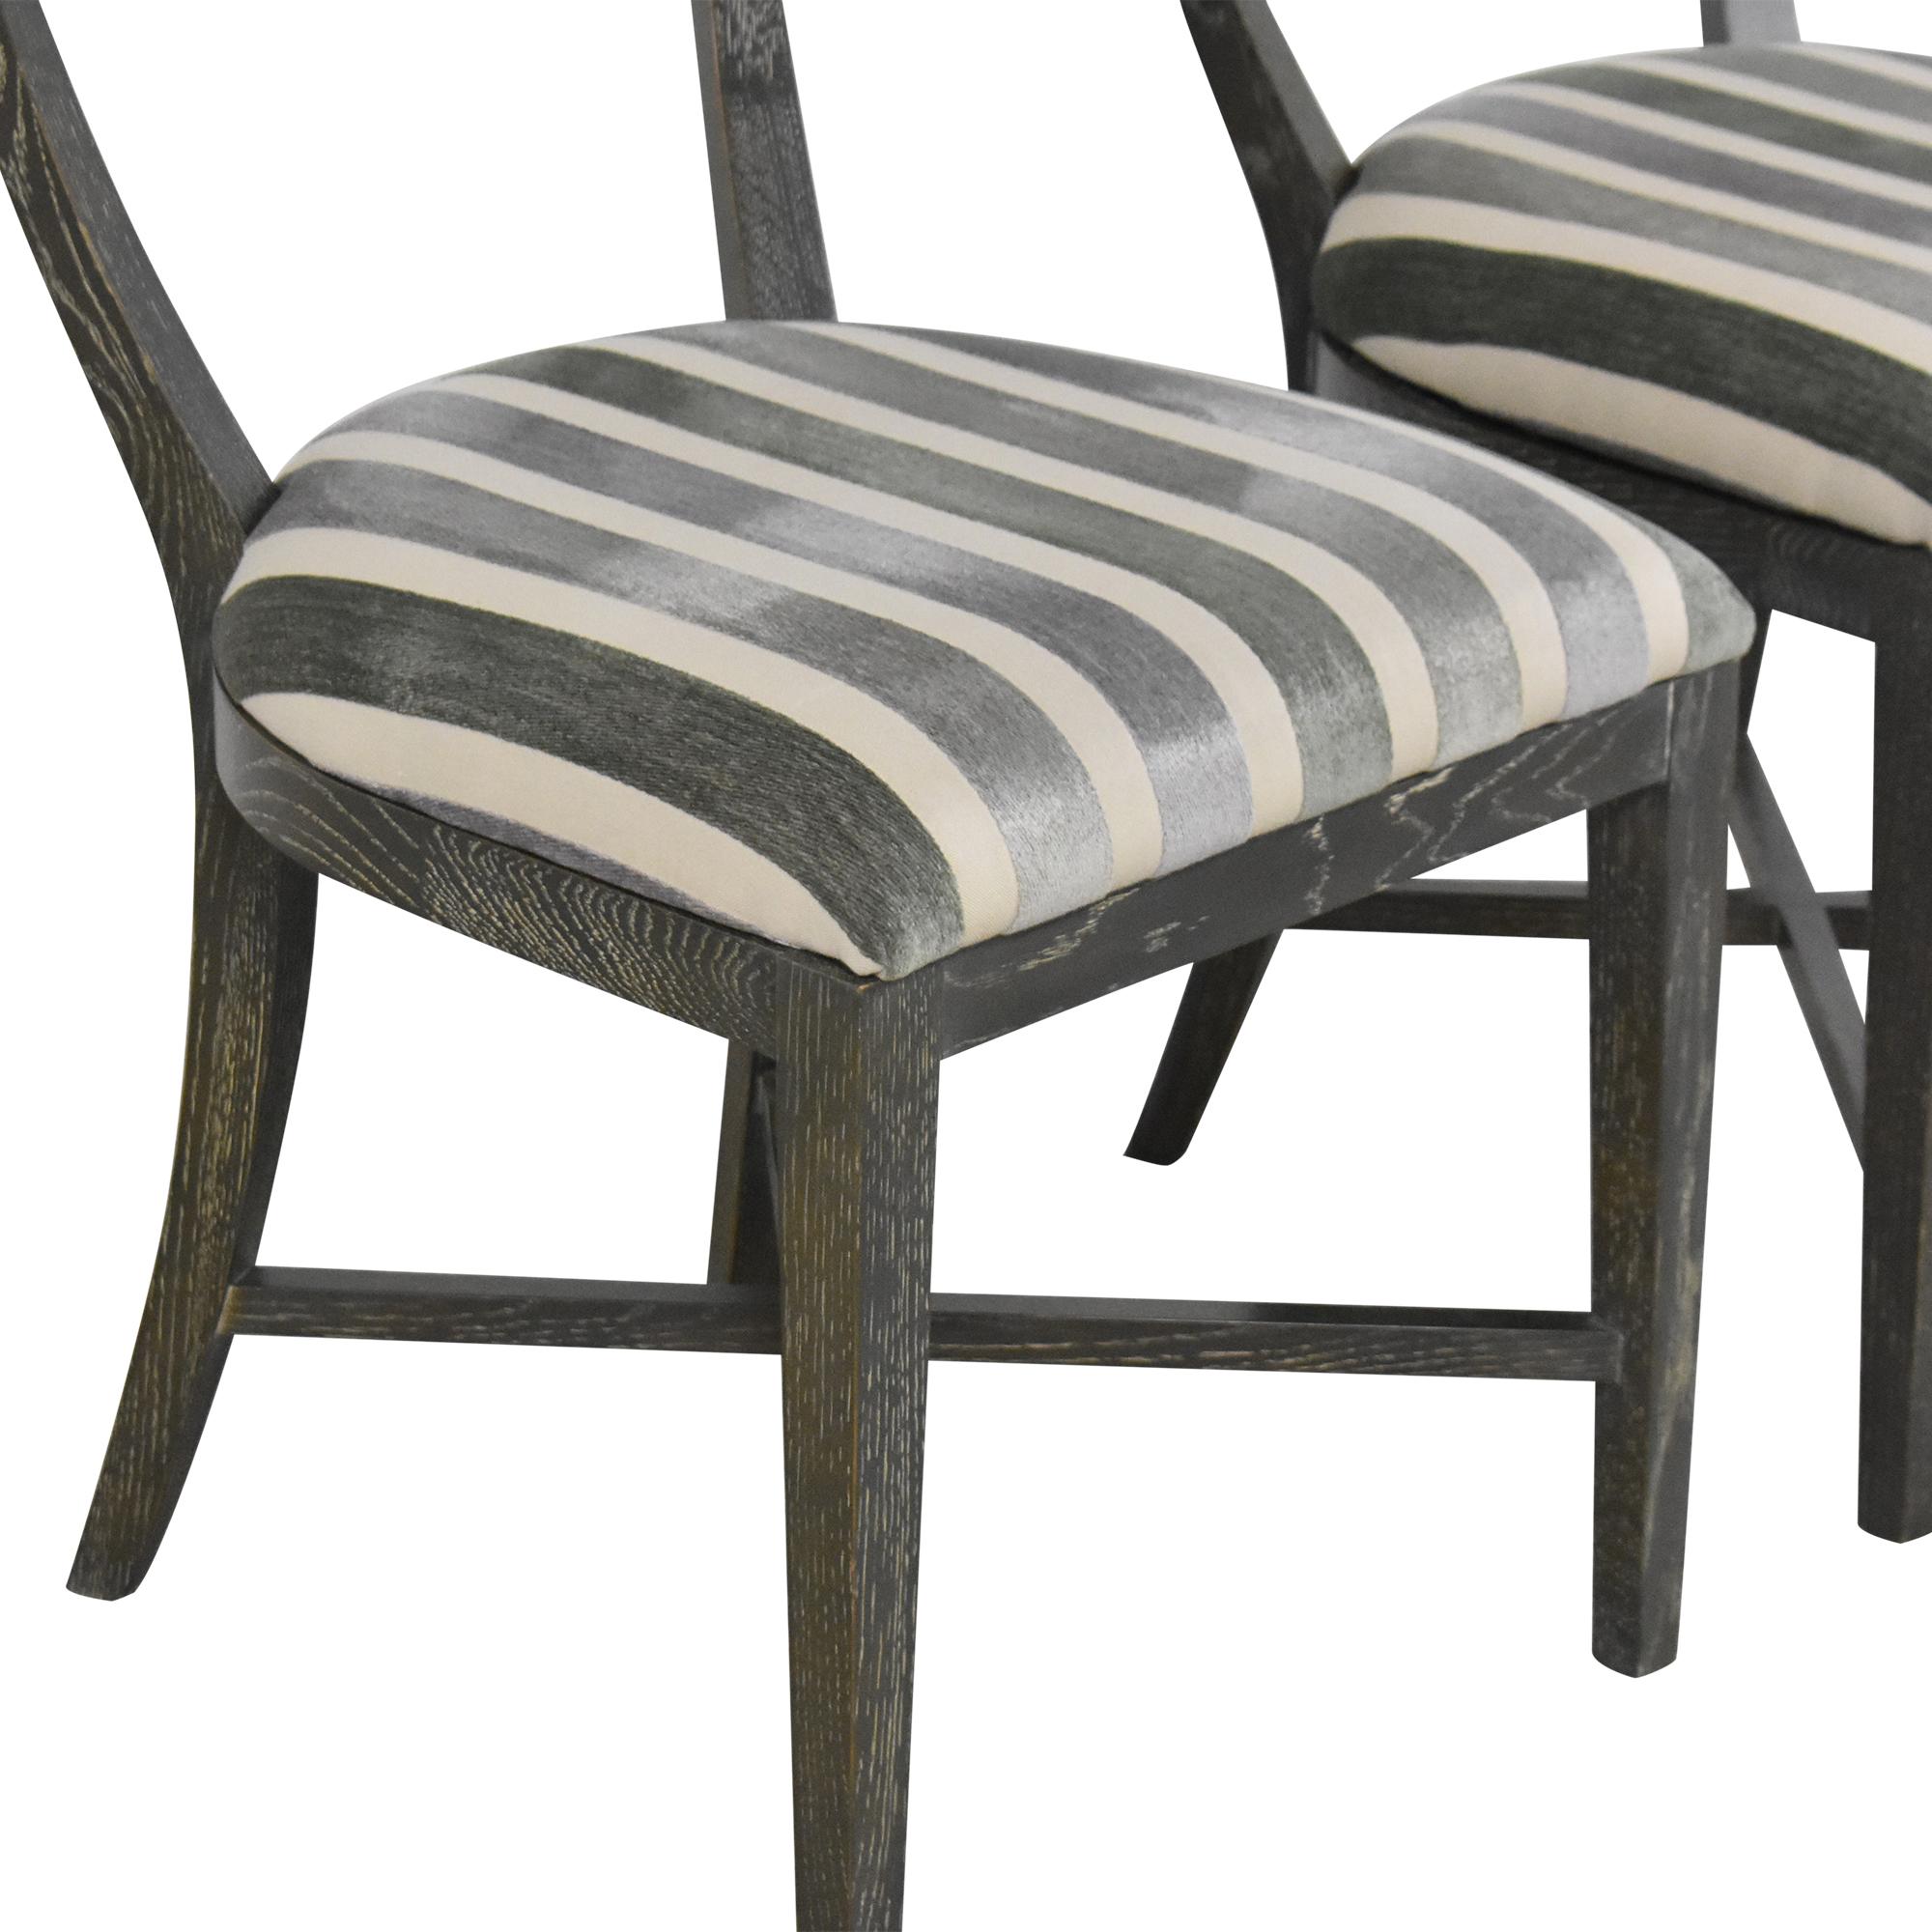 Arteriors Arteriors Caden Dining Chairs nj